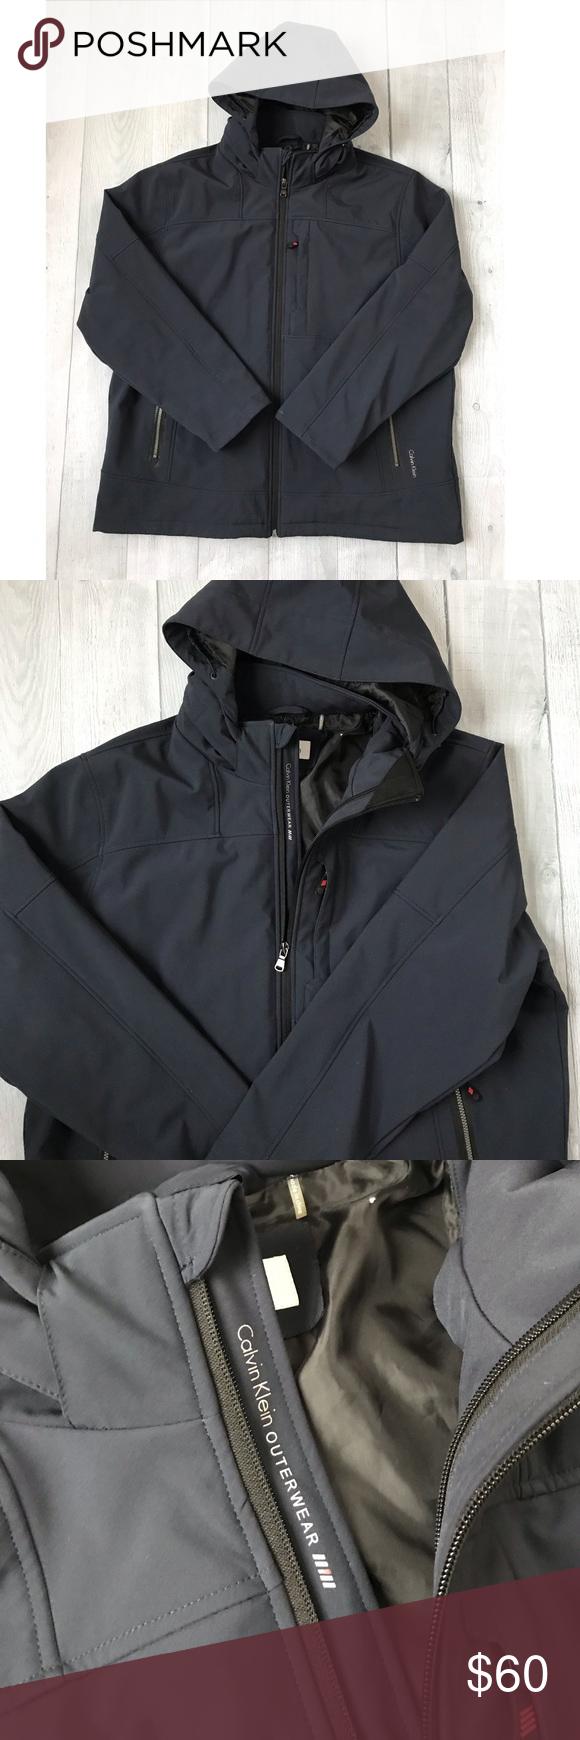 Calvin Klein Outerwear Men S Xl Jacket Navy Calvin Klein Outerwear Jackets [ 1740 x 580 Pixel ]